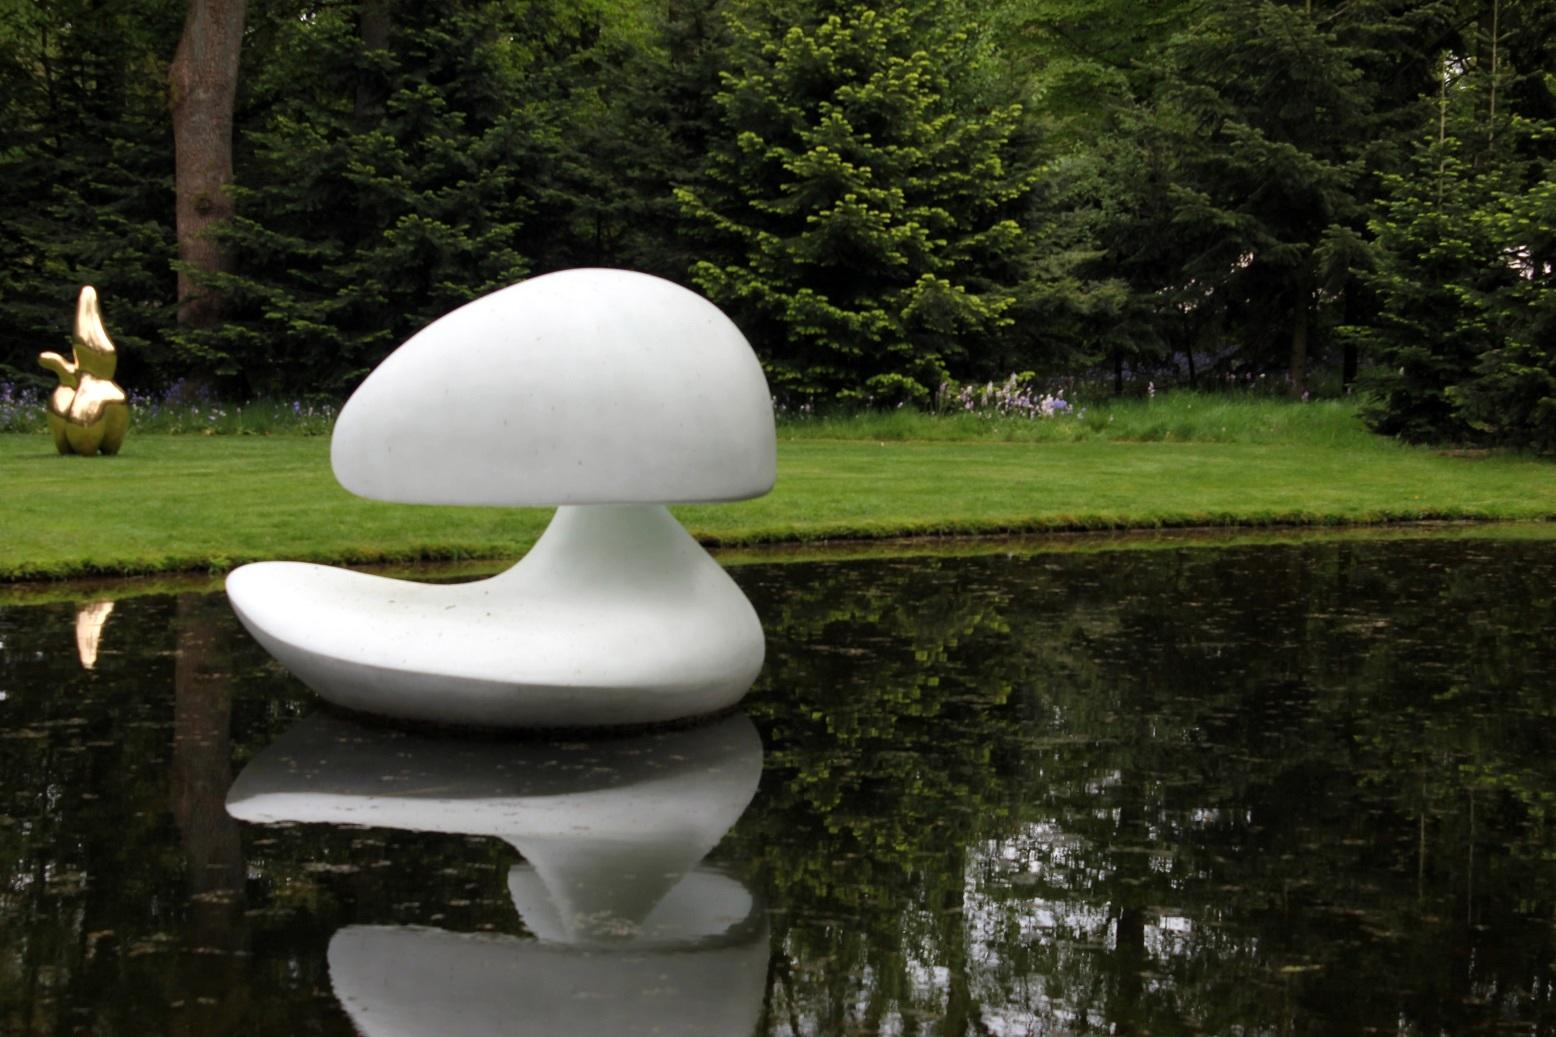 Jardín de esculturas del Museo Kröller-Müller. Foto: Jaime Diarte.